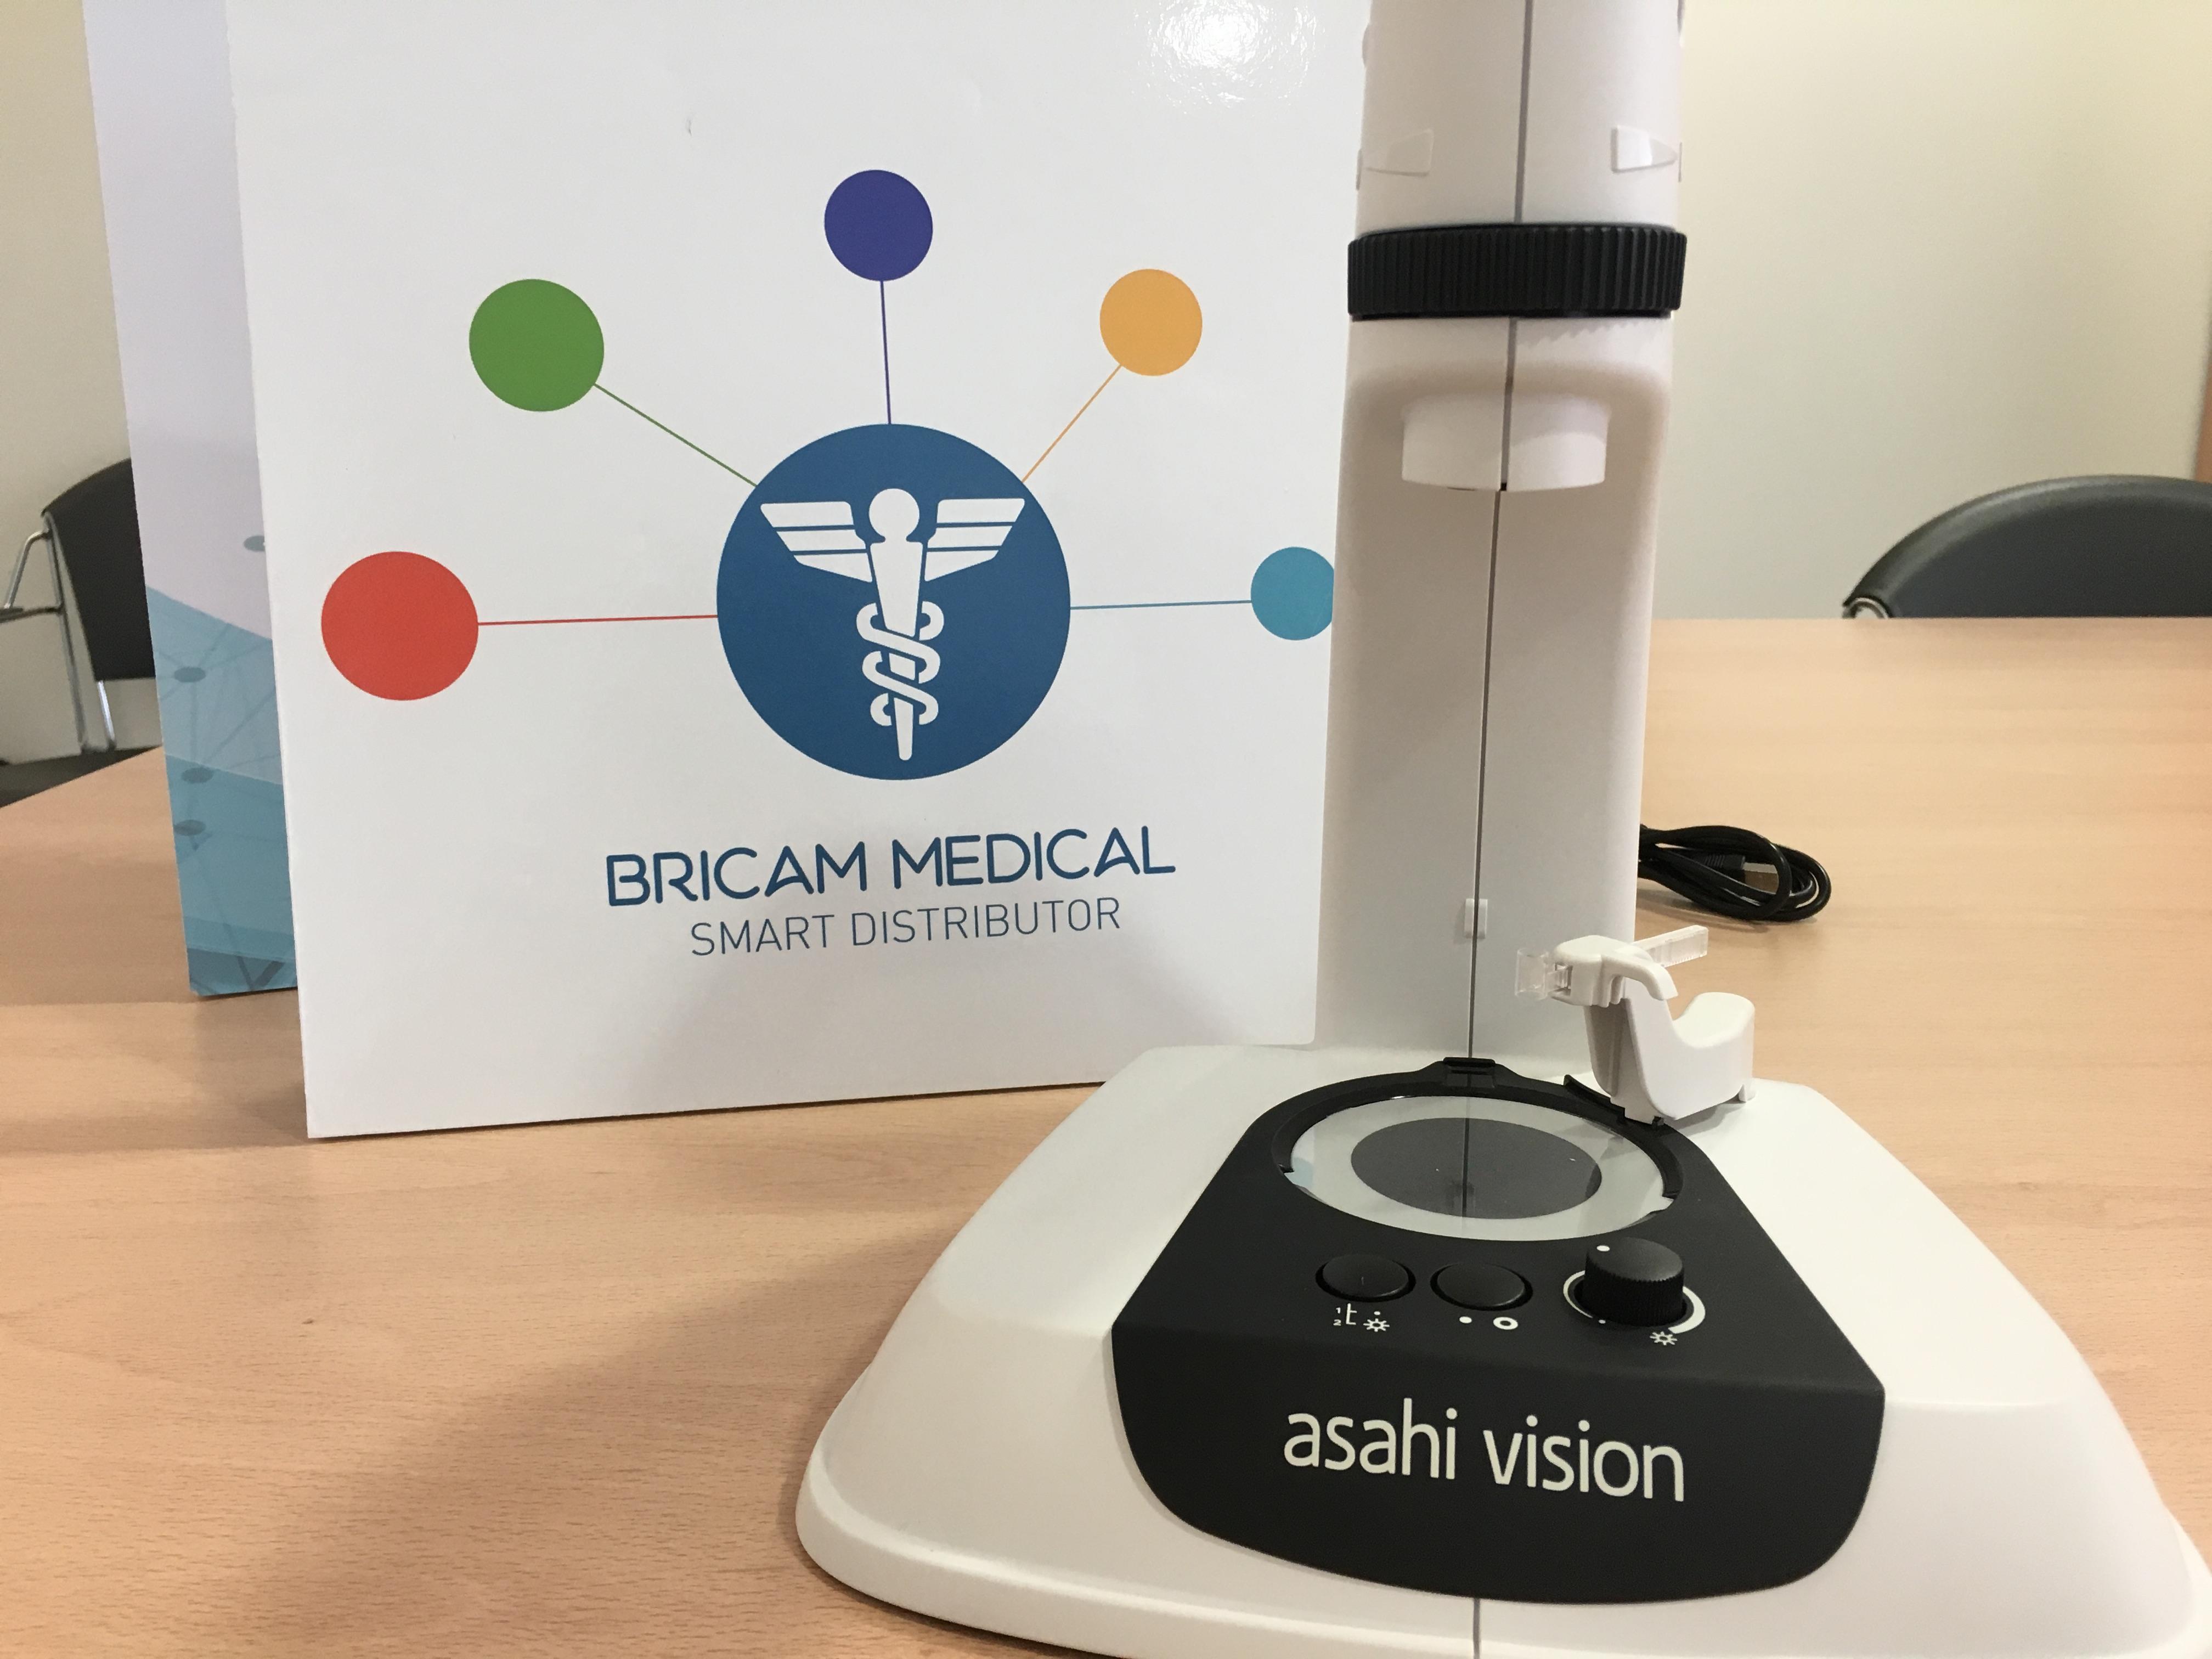 aLC-100 BricamMedical Asahi